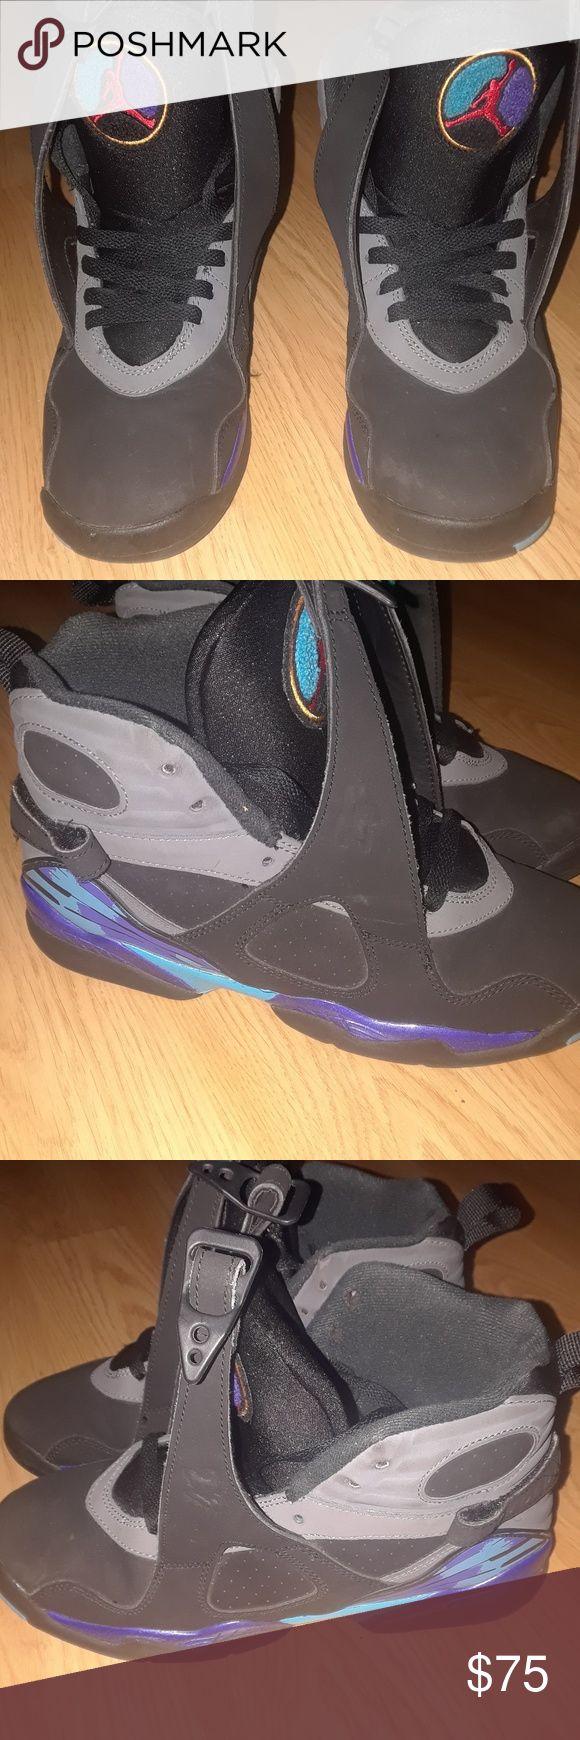 Jordan aqua 8 size 6 Worn 4 times has no creases in great shape Jordan Shoes Sneakers